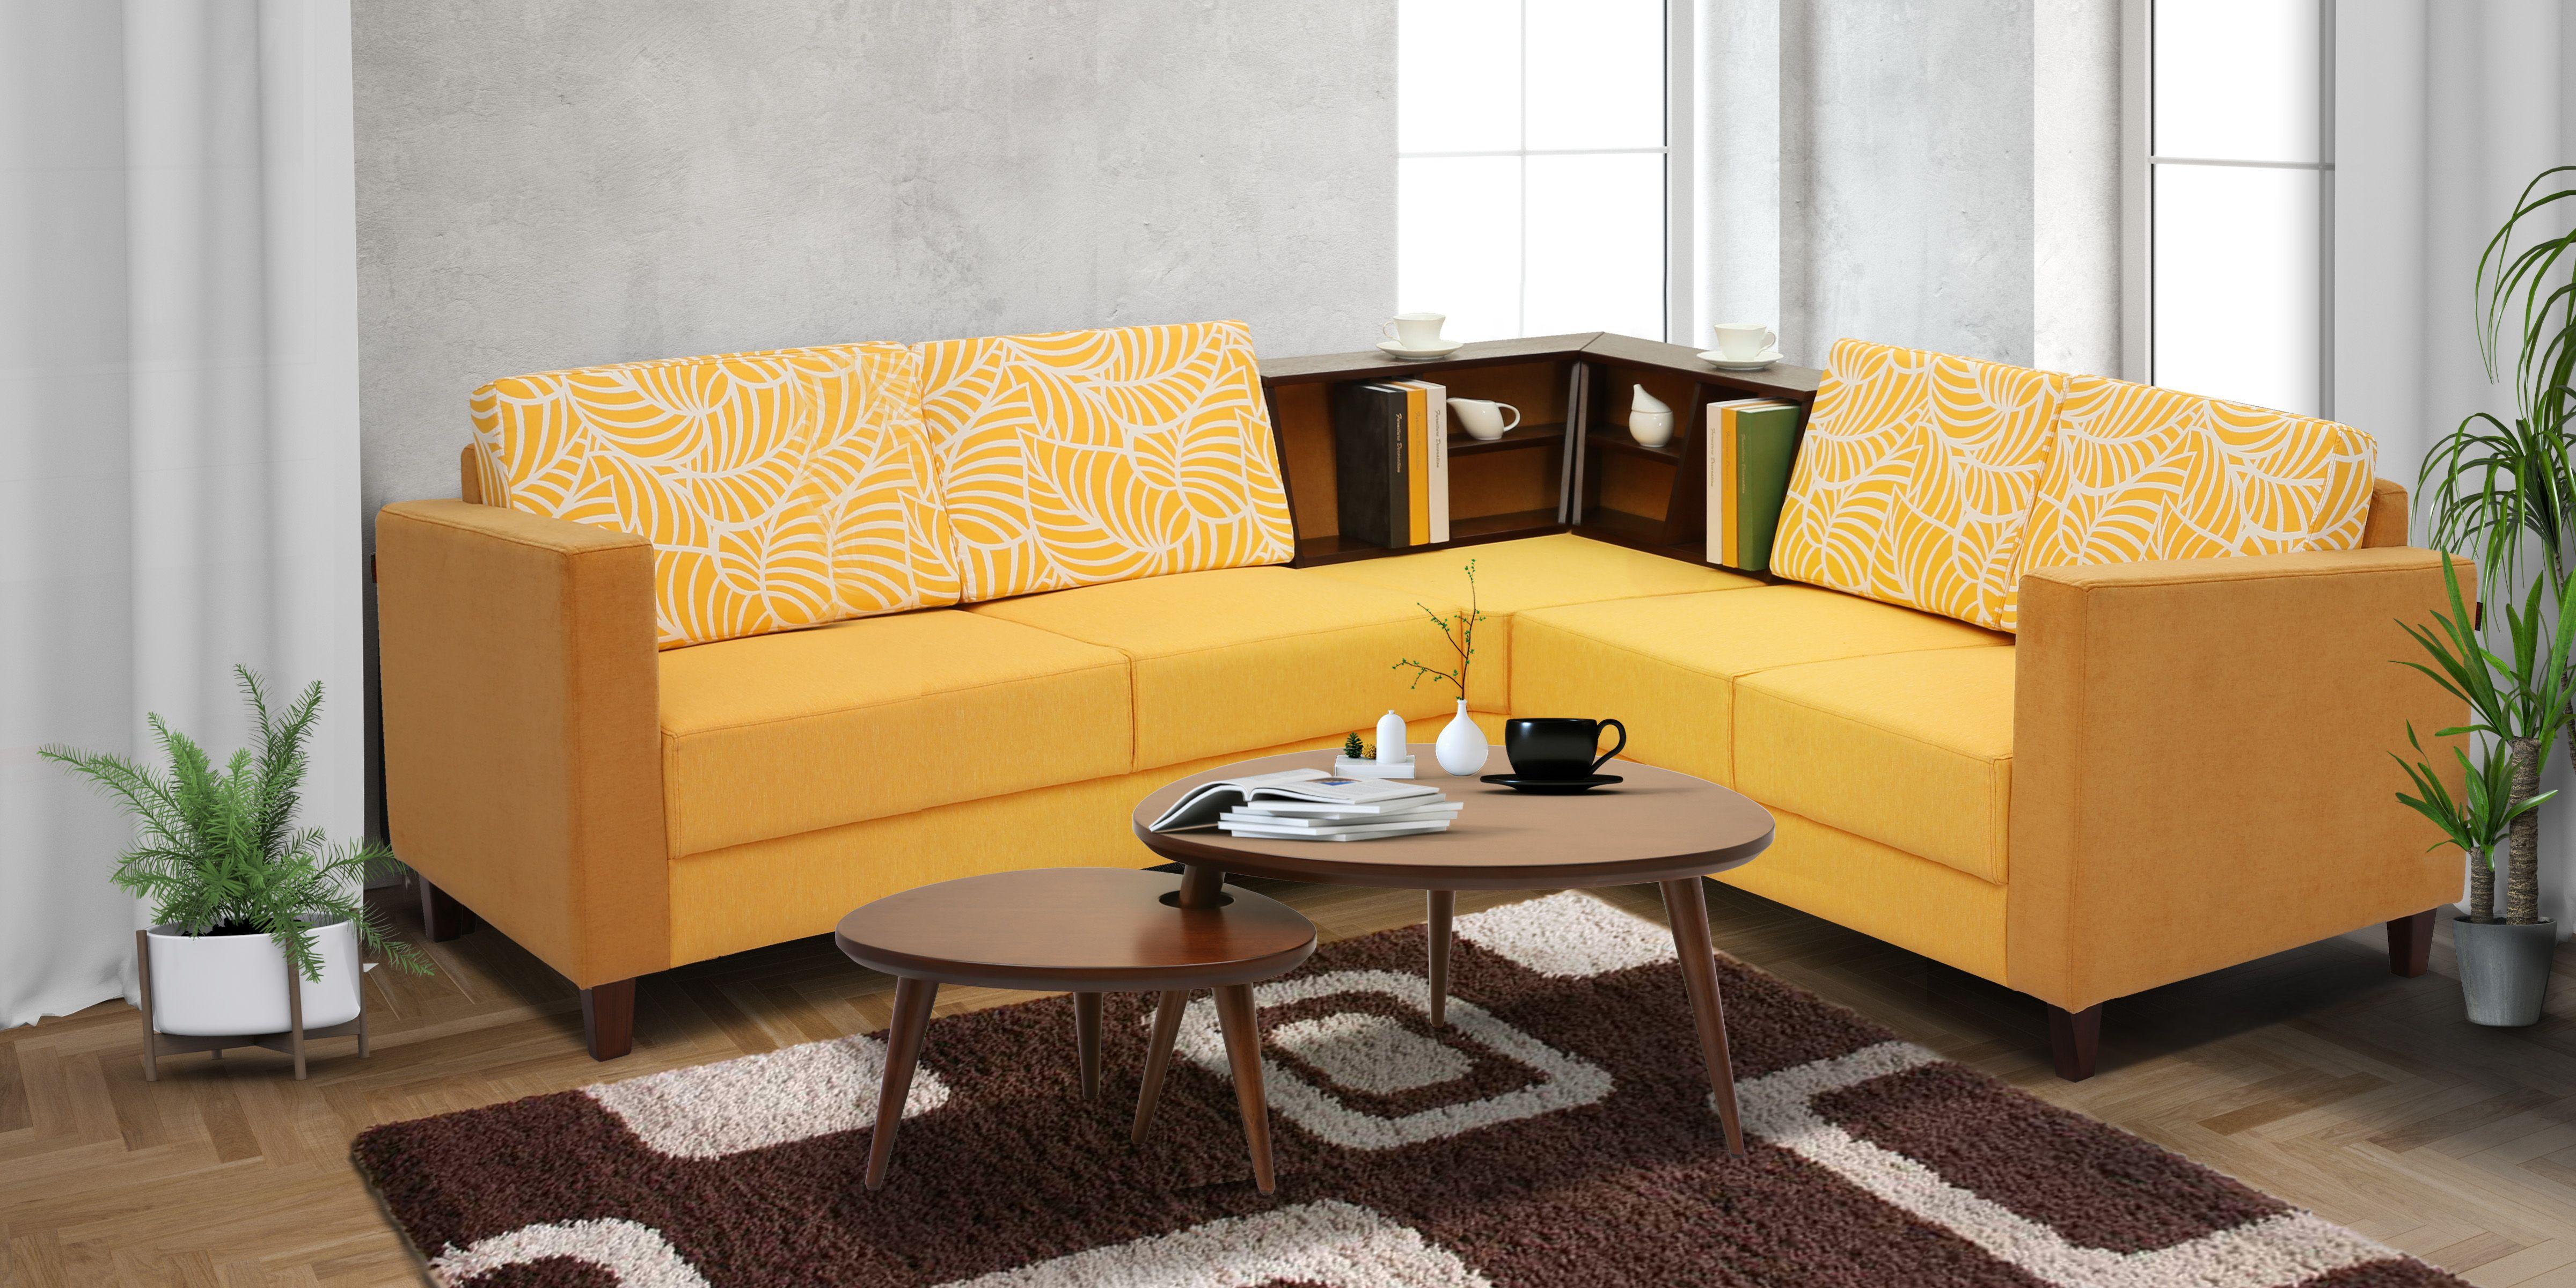 Hatil Wooden Sofa Blue Sofas Living Room Sofa Set Wooden Sofa